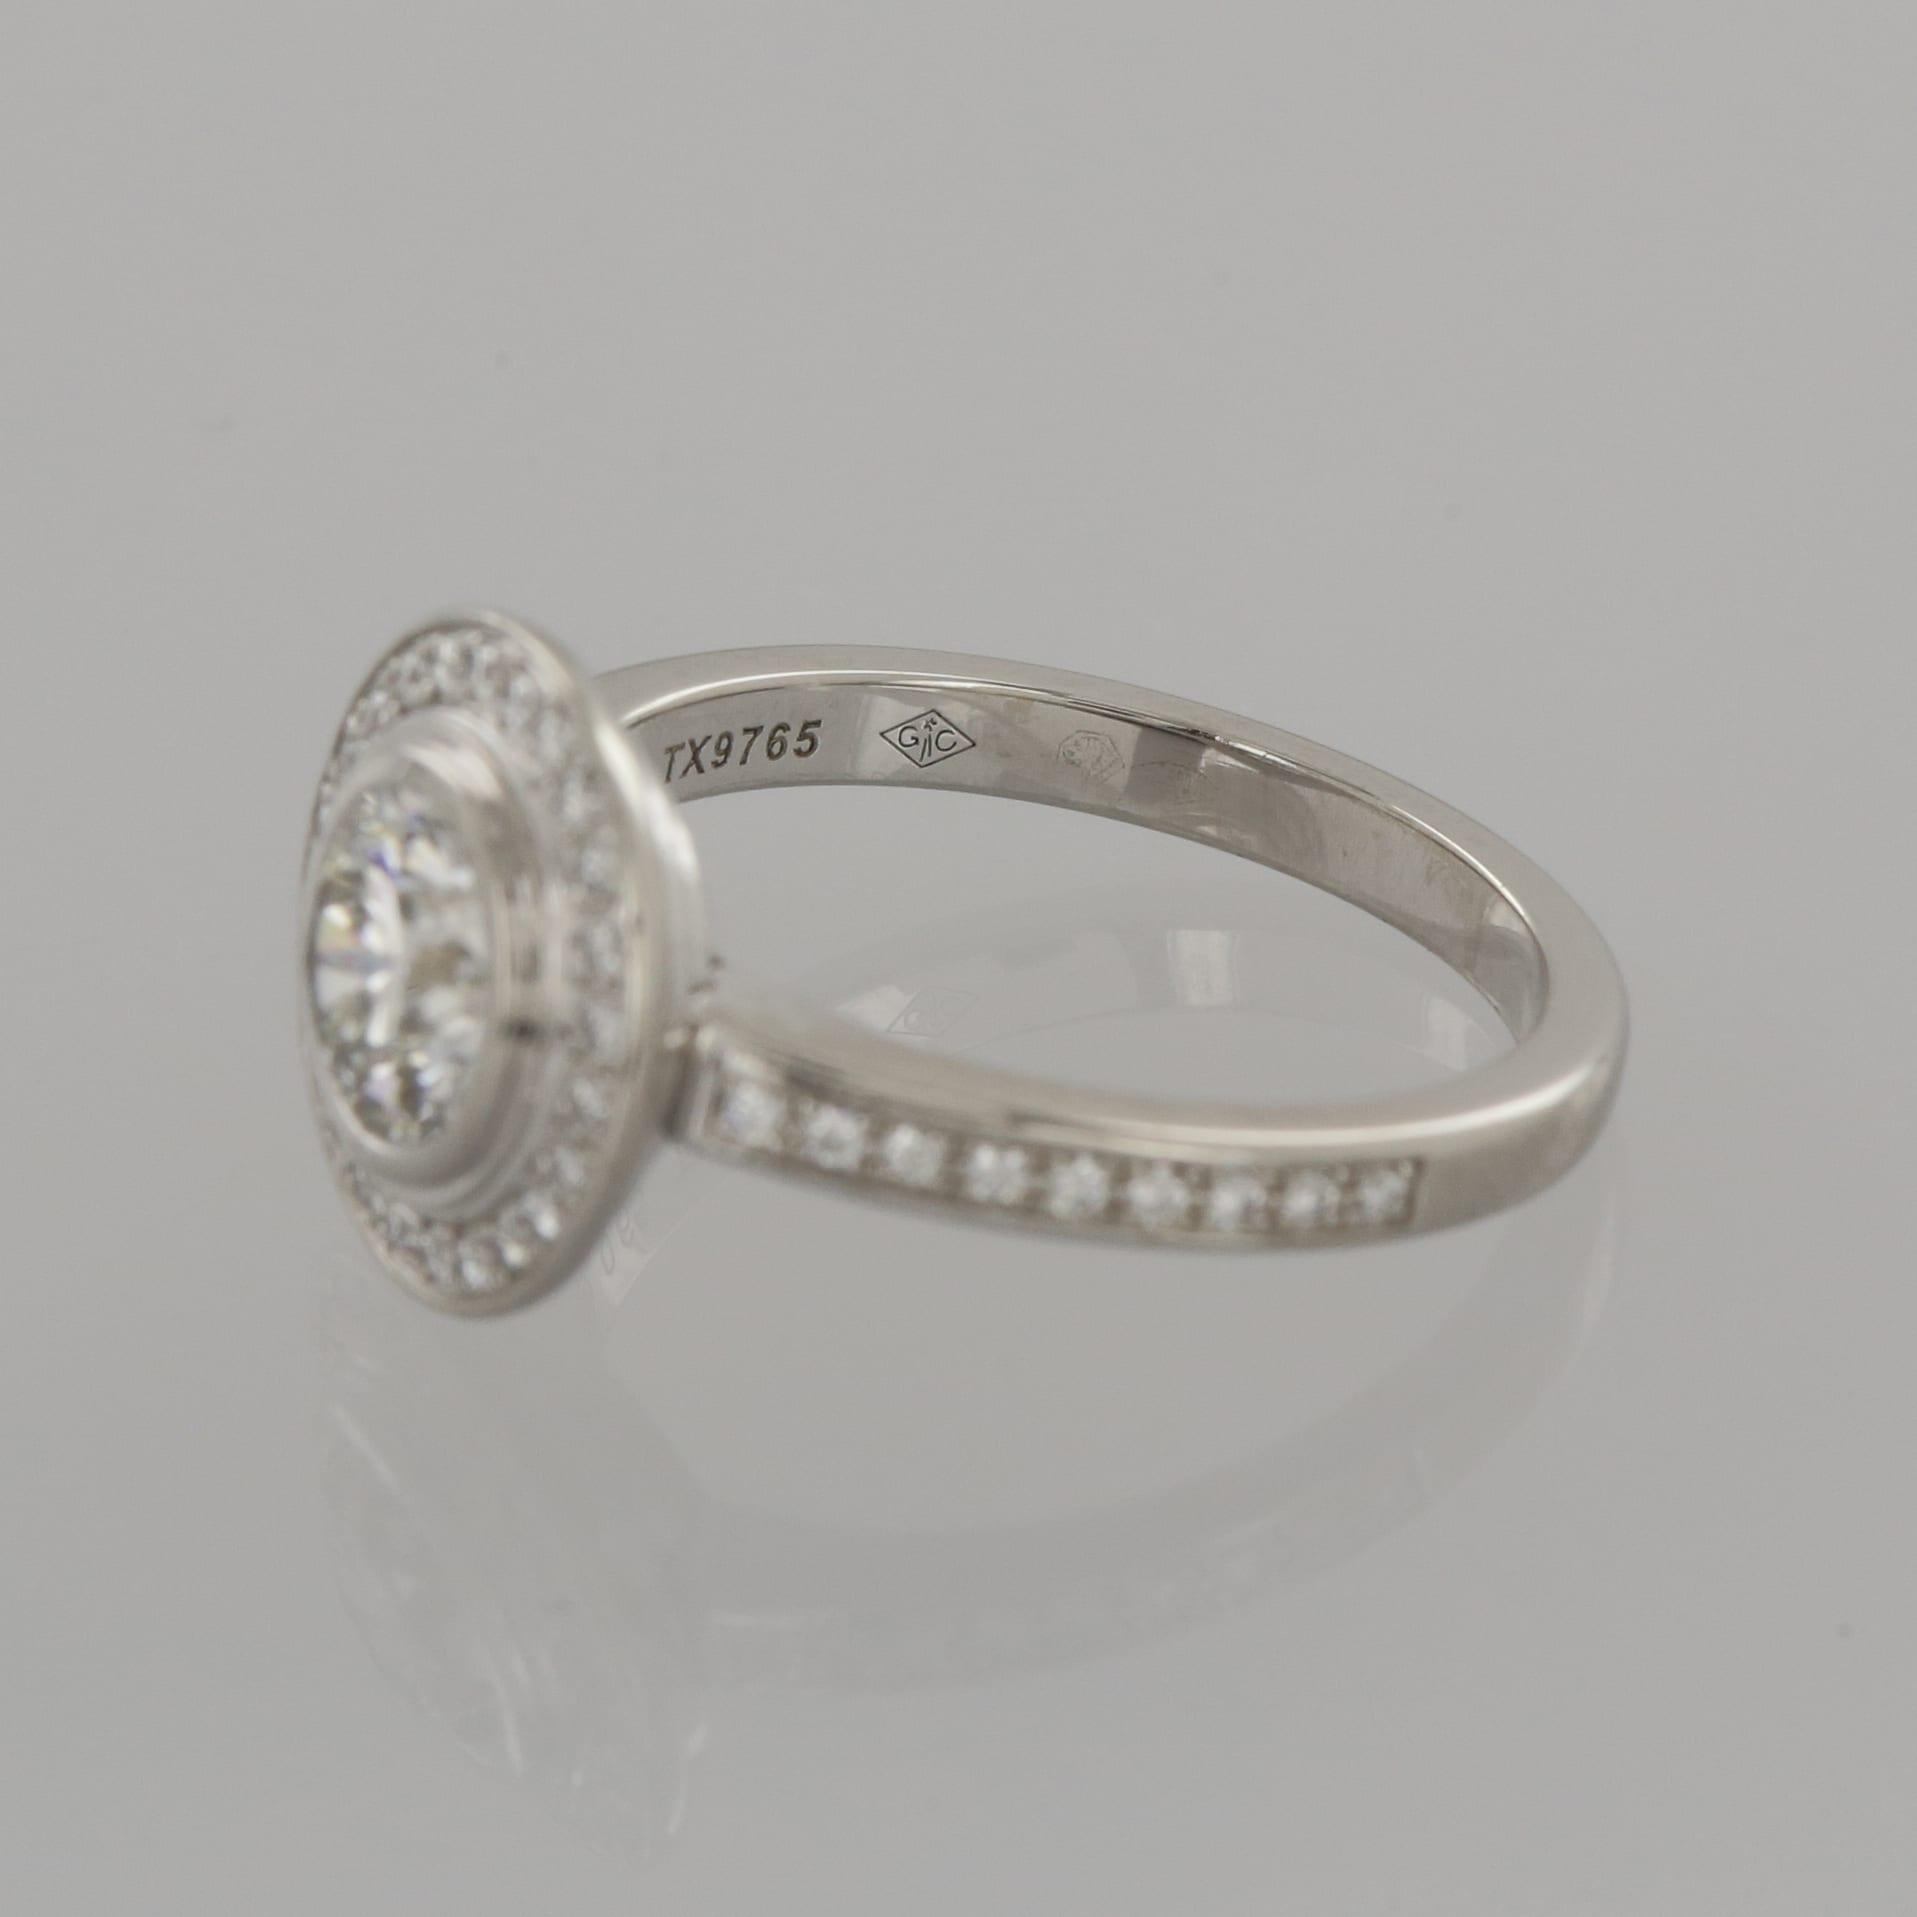 Cartier Solitaire D Amour Diamond Engagement Ring The Vintage